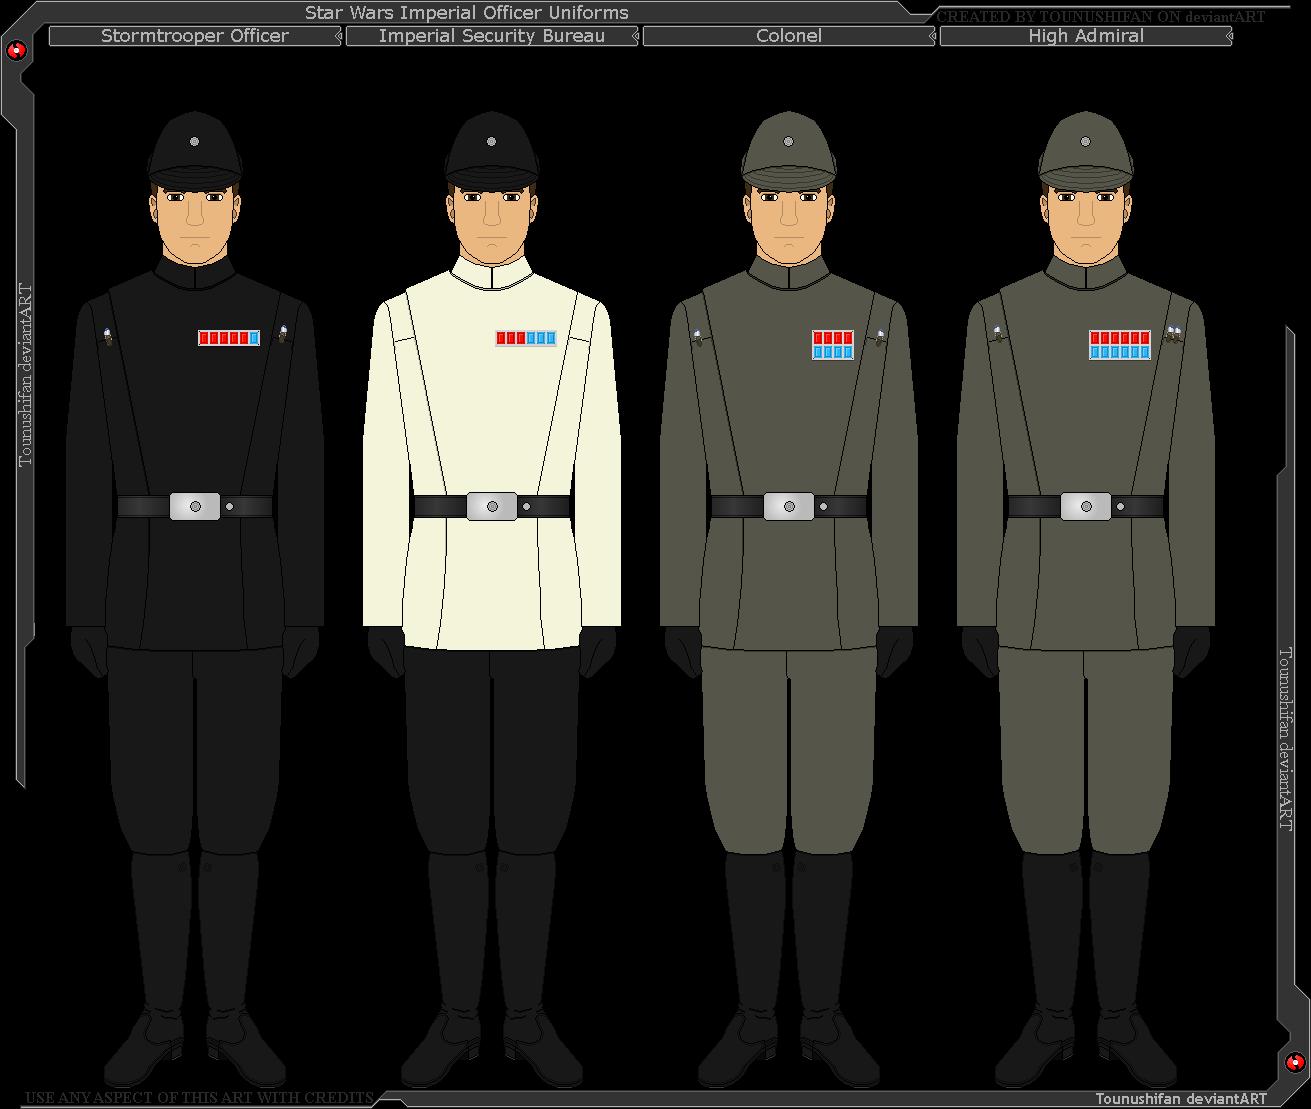 Star Wars - Imperial Officer Uniforms by Grand-Lobster-King on DeviantArt